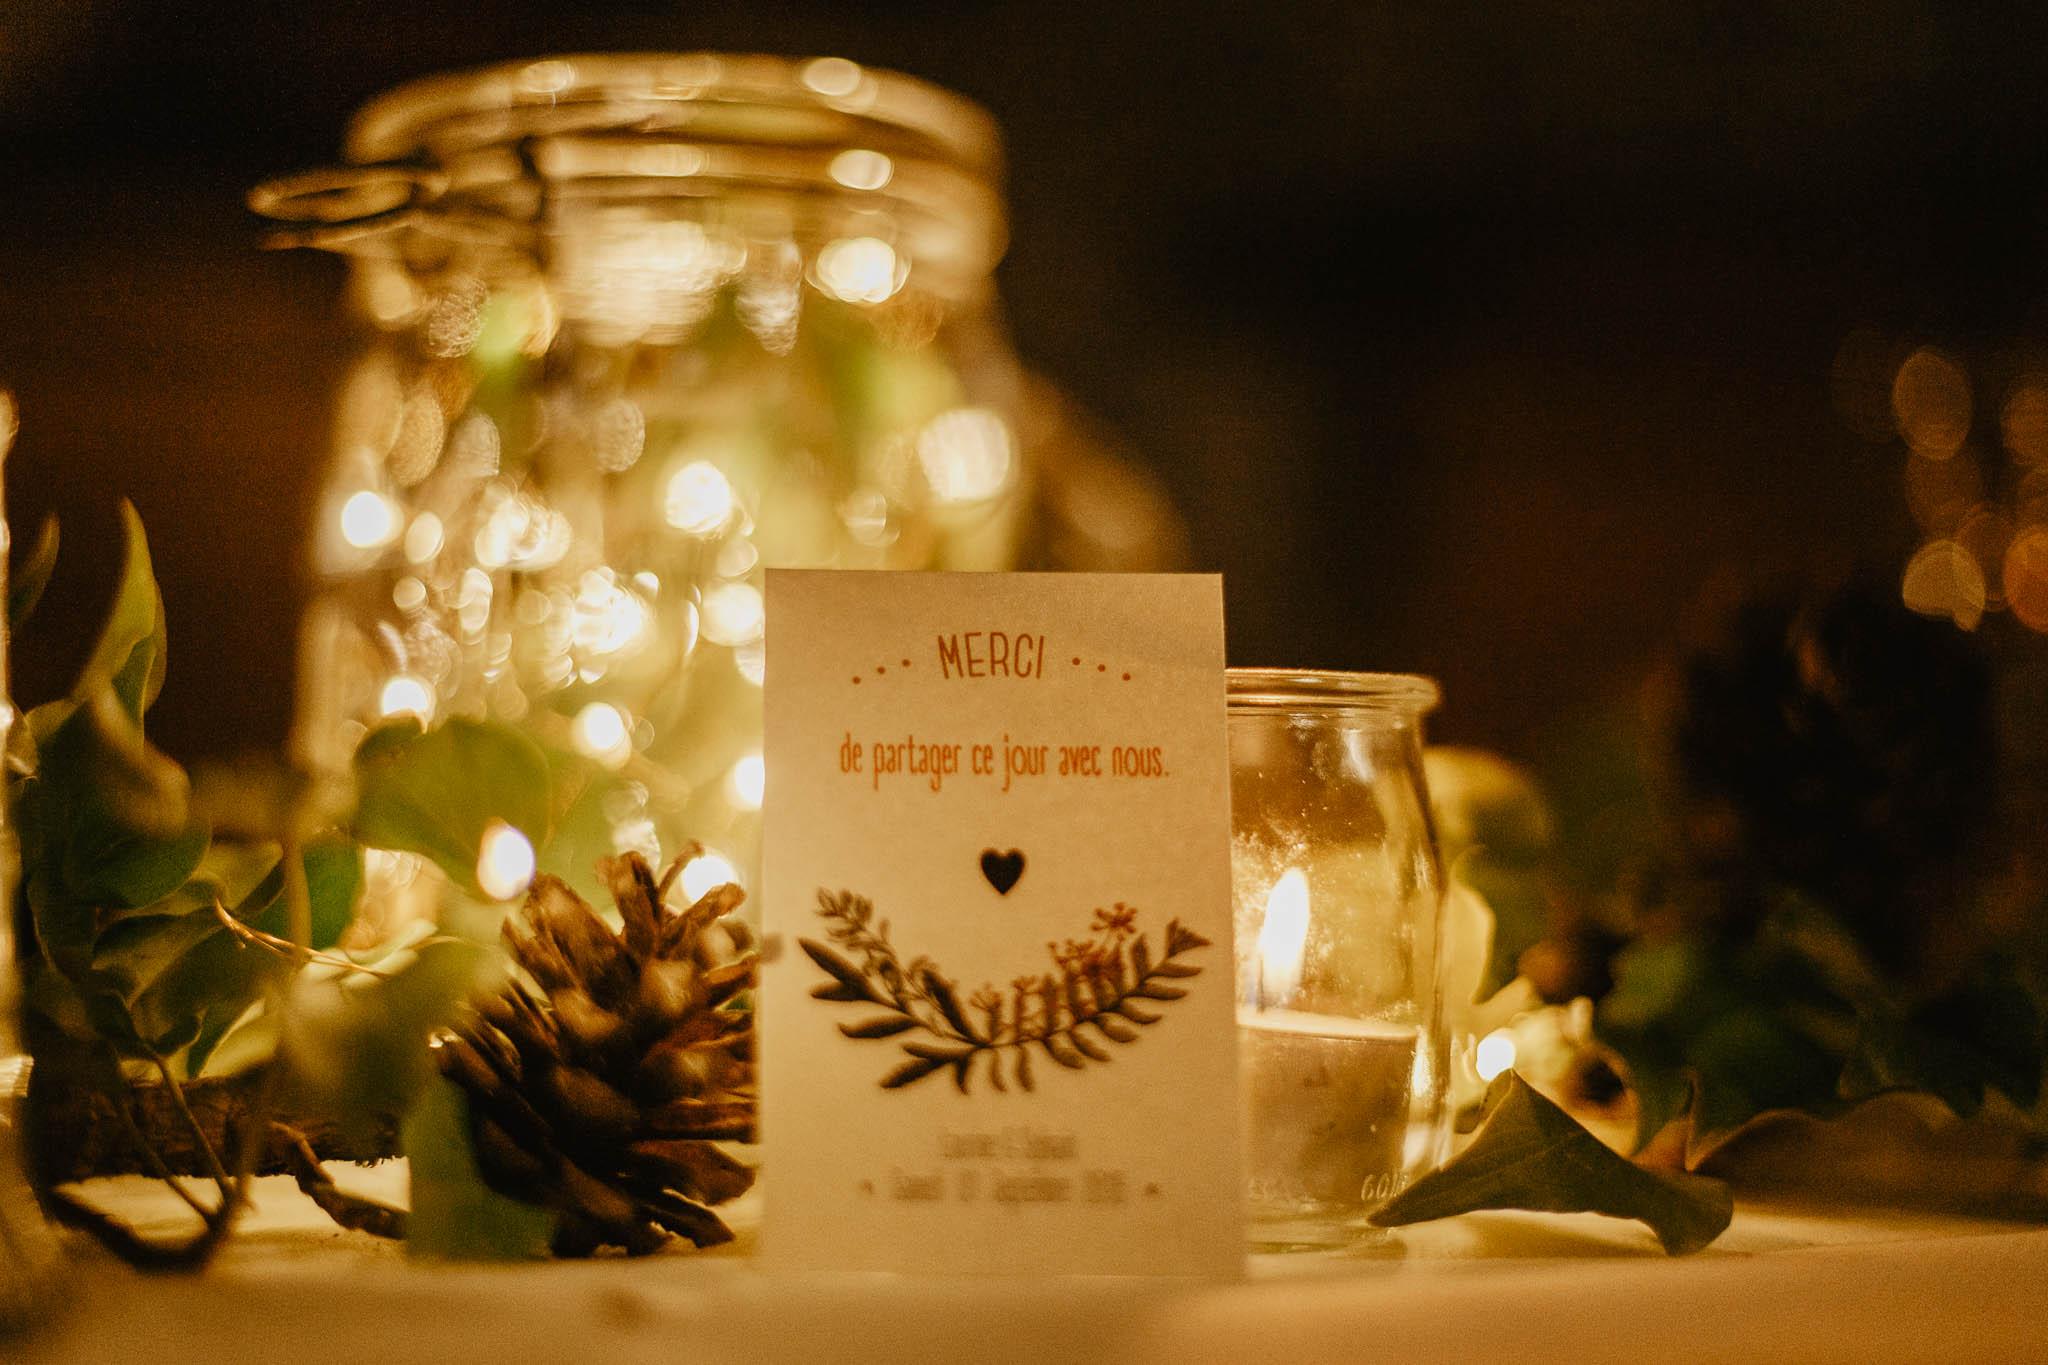 mariage-soirée-cantal-ingold-1.jpg